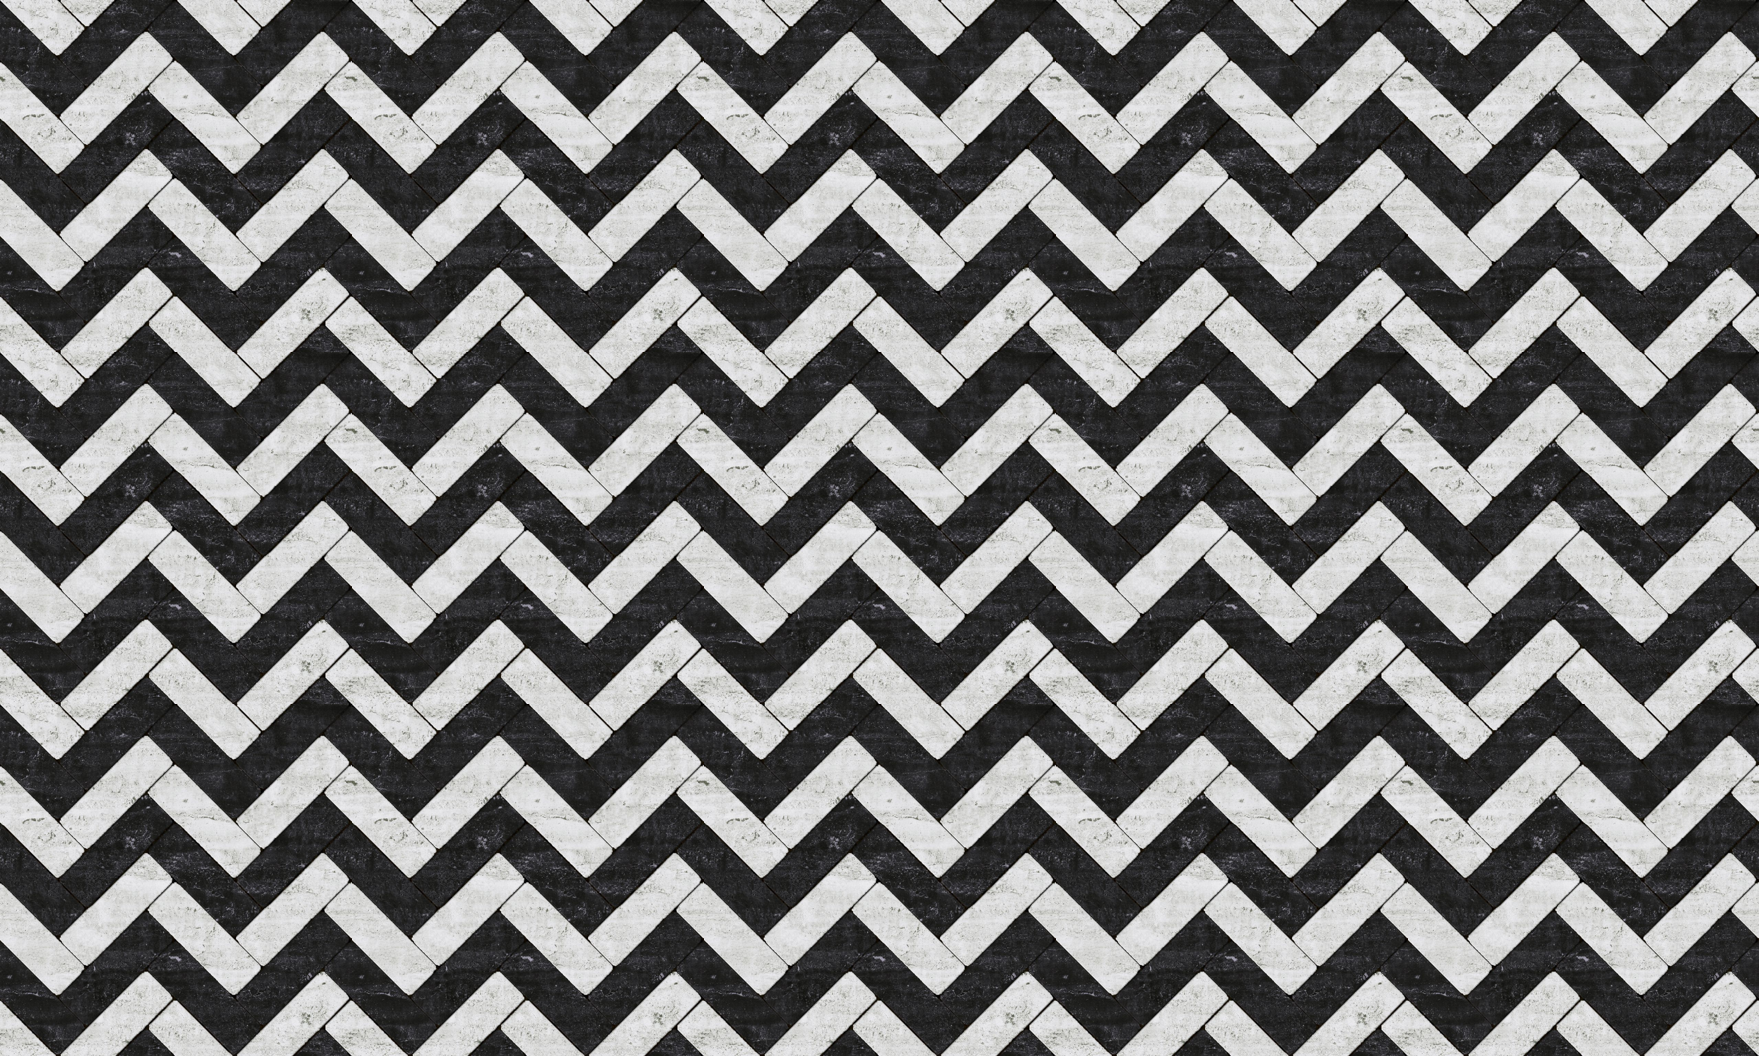 Free Dollhouse Flooring Printables Undersized Urbanite Black And White Marble White Marble Tiles Dollhouse Flooring